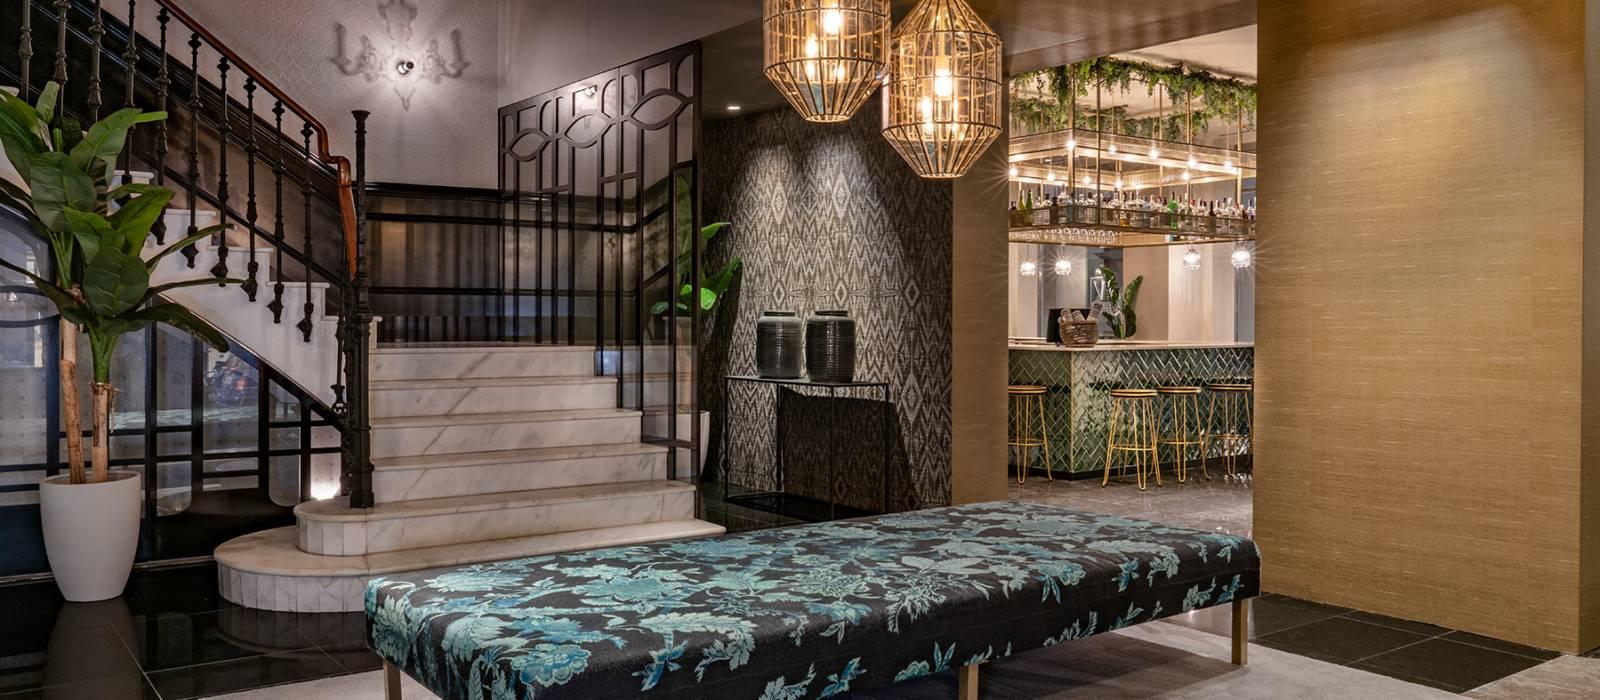 Hotel Vincci Palace 4* - Valencia